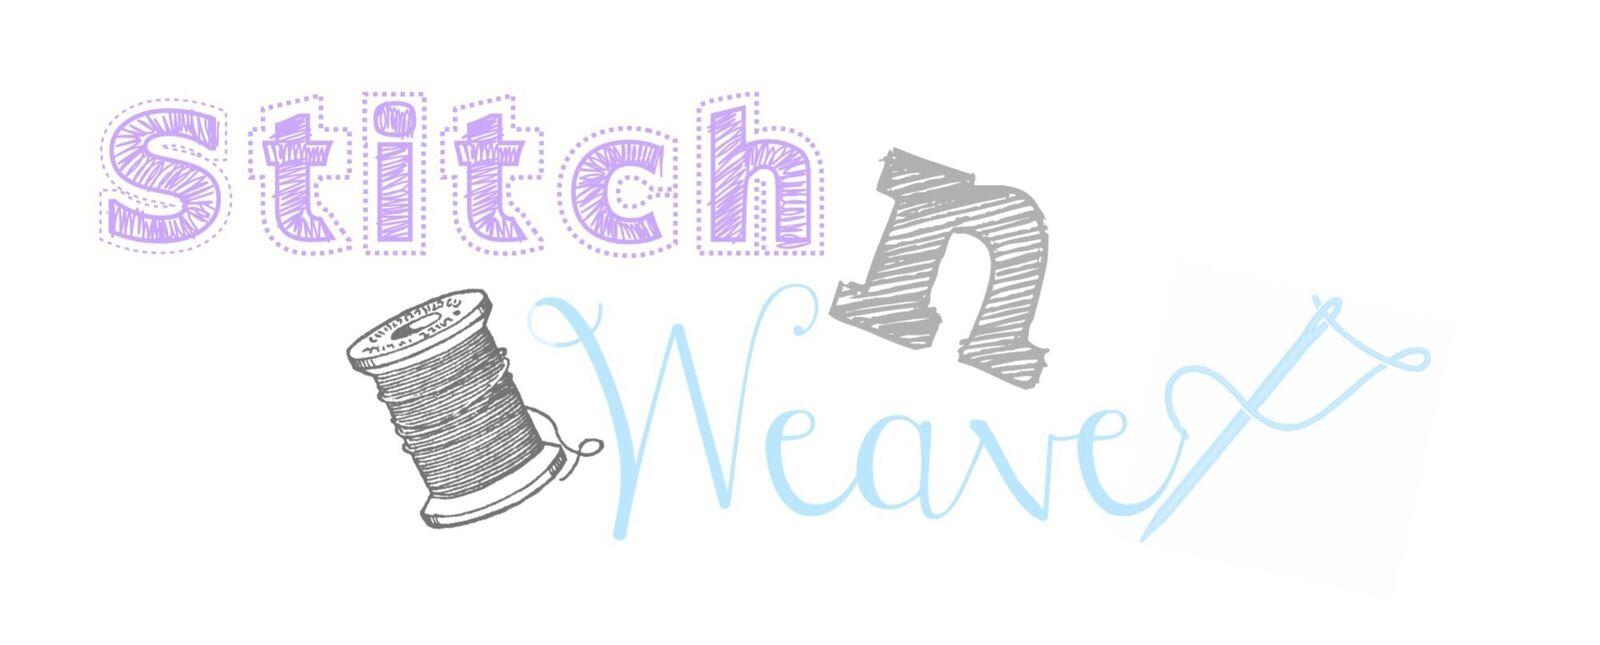 Stitch&Weave